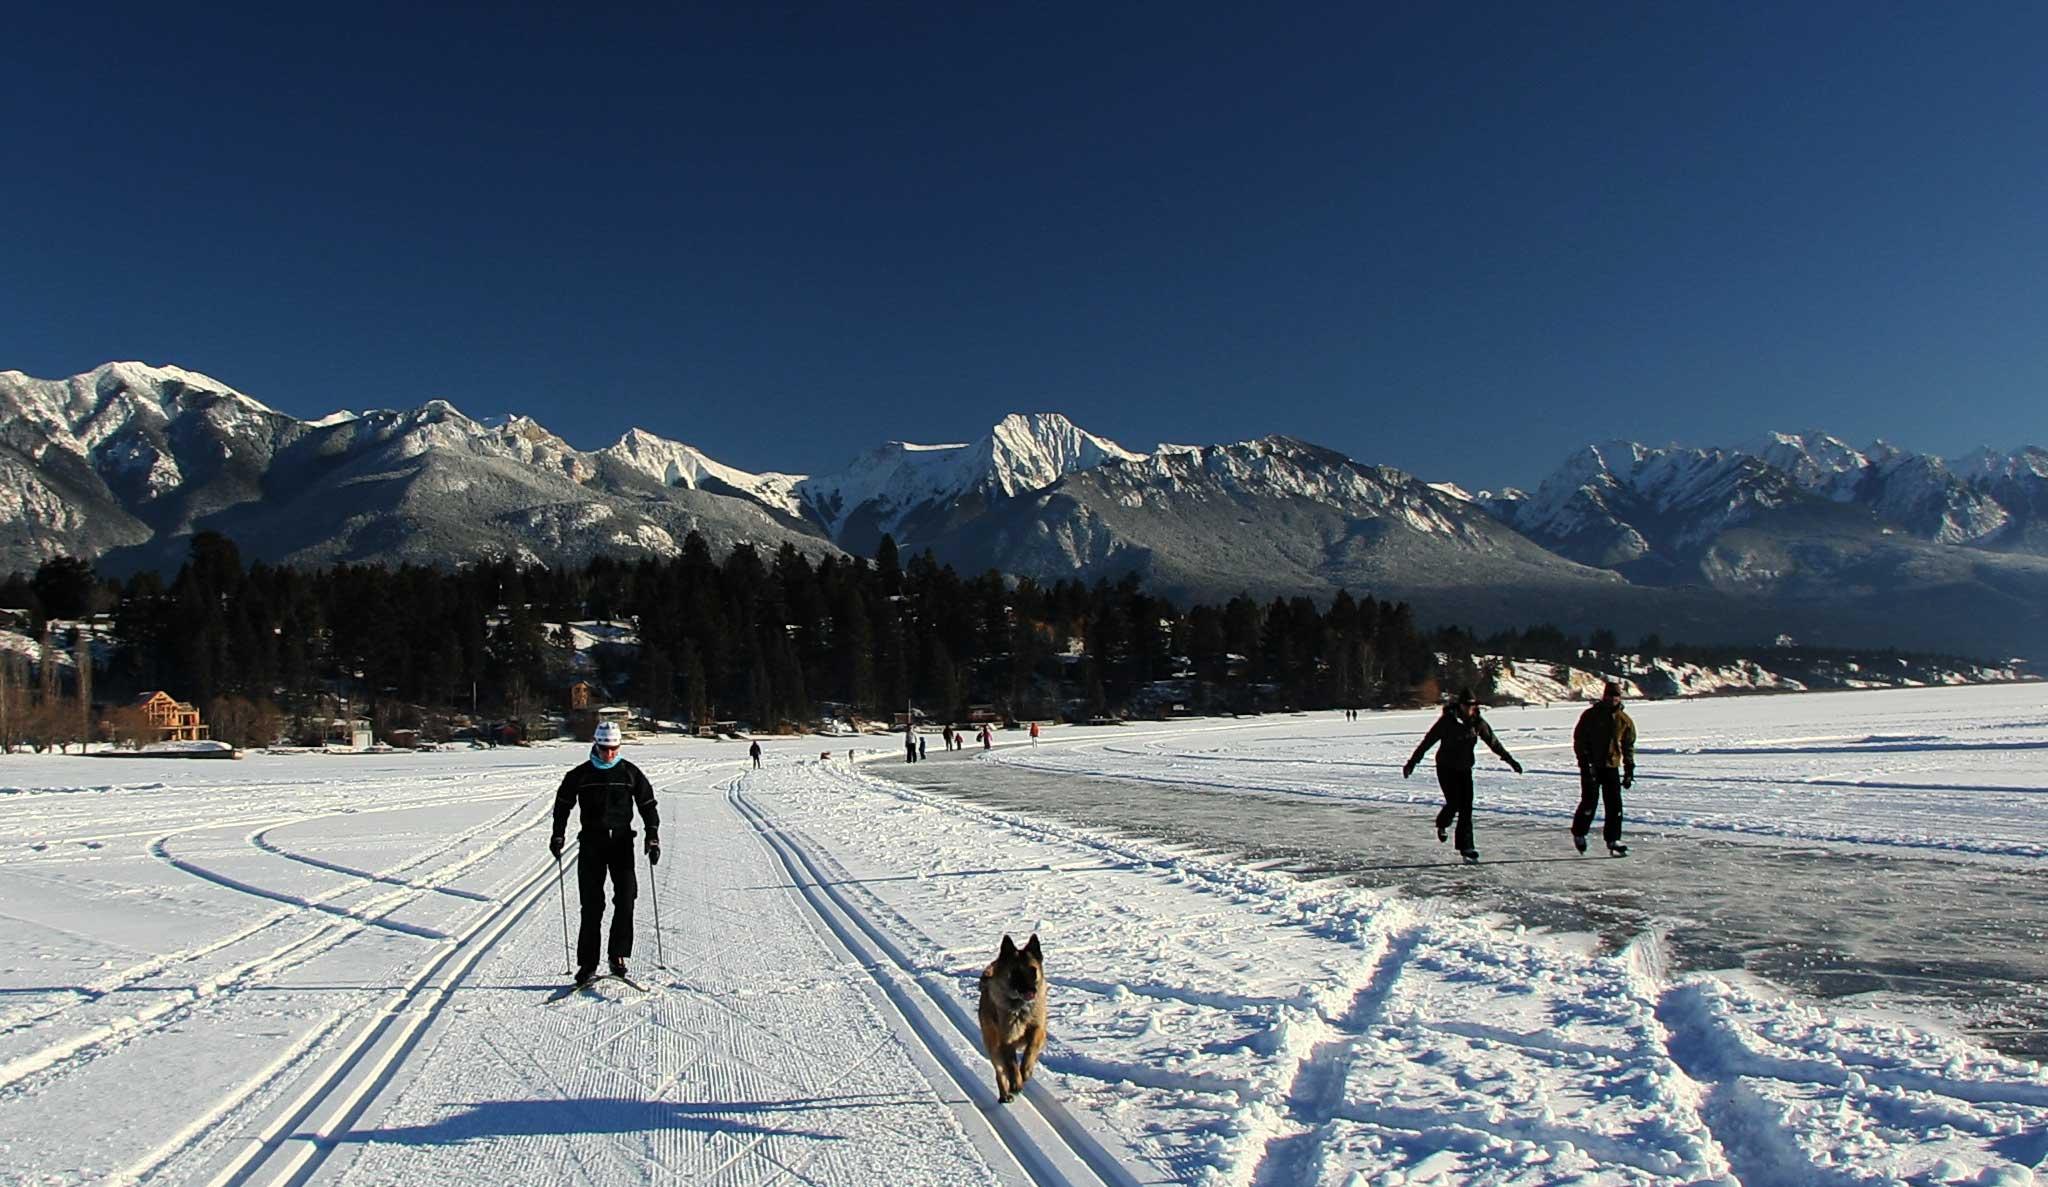 Toby Creek Nordic Ski Club - Invermere BC